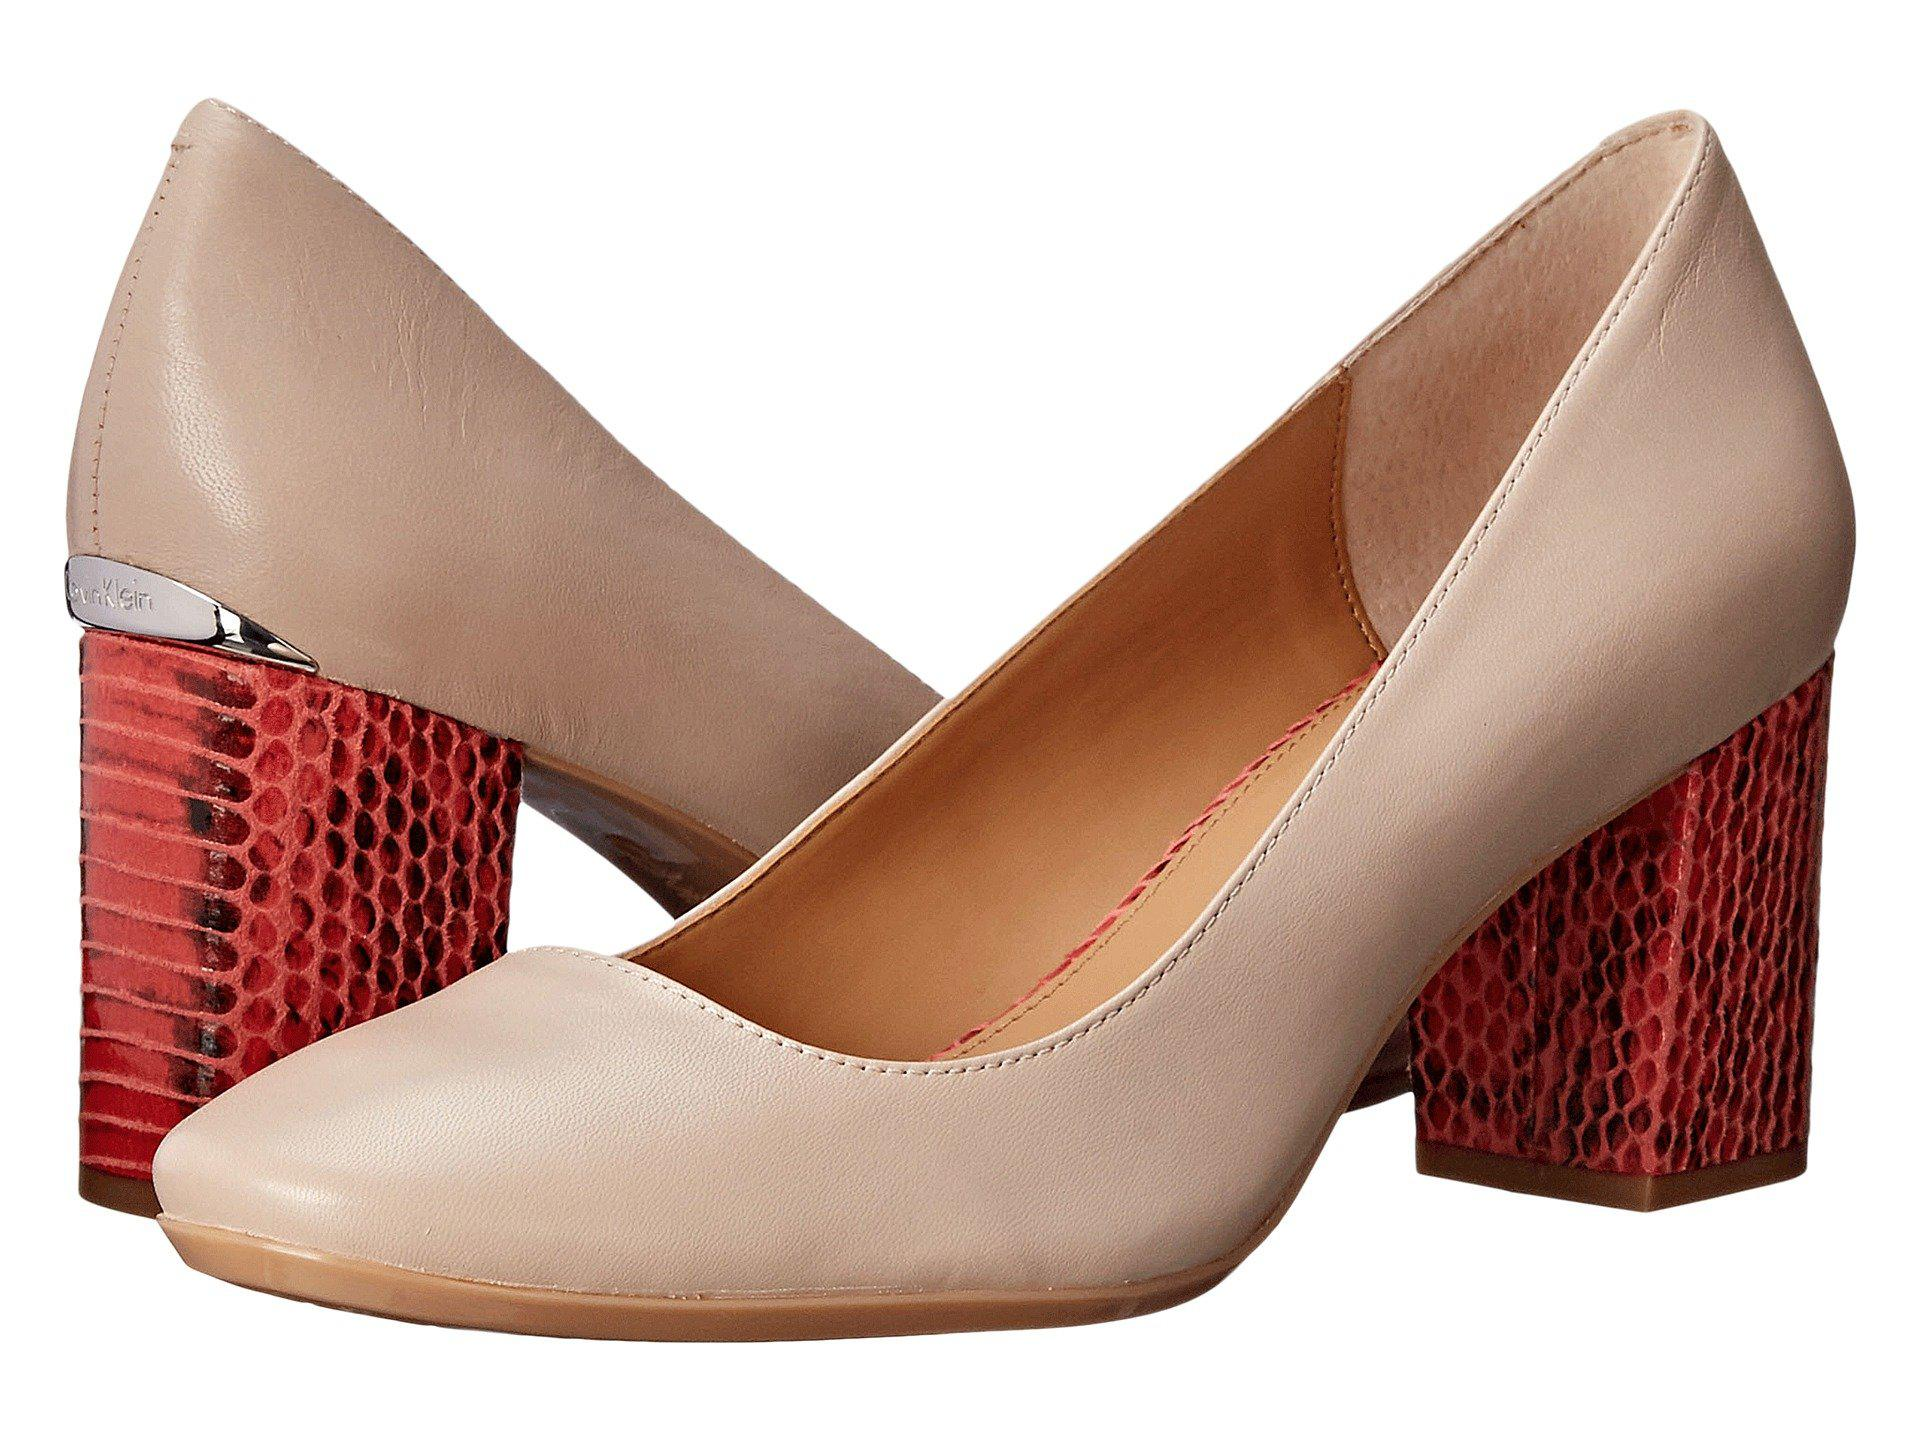 Womens Shoes Calvin Klein Cirilla Cocoon Leather